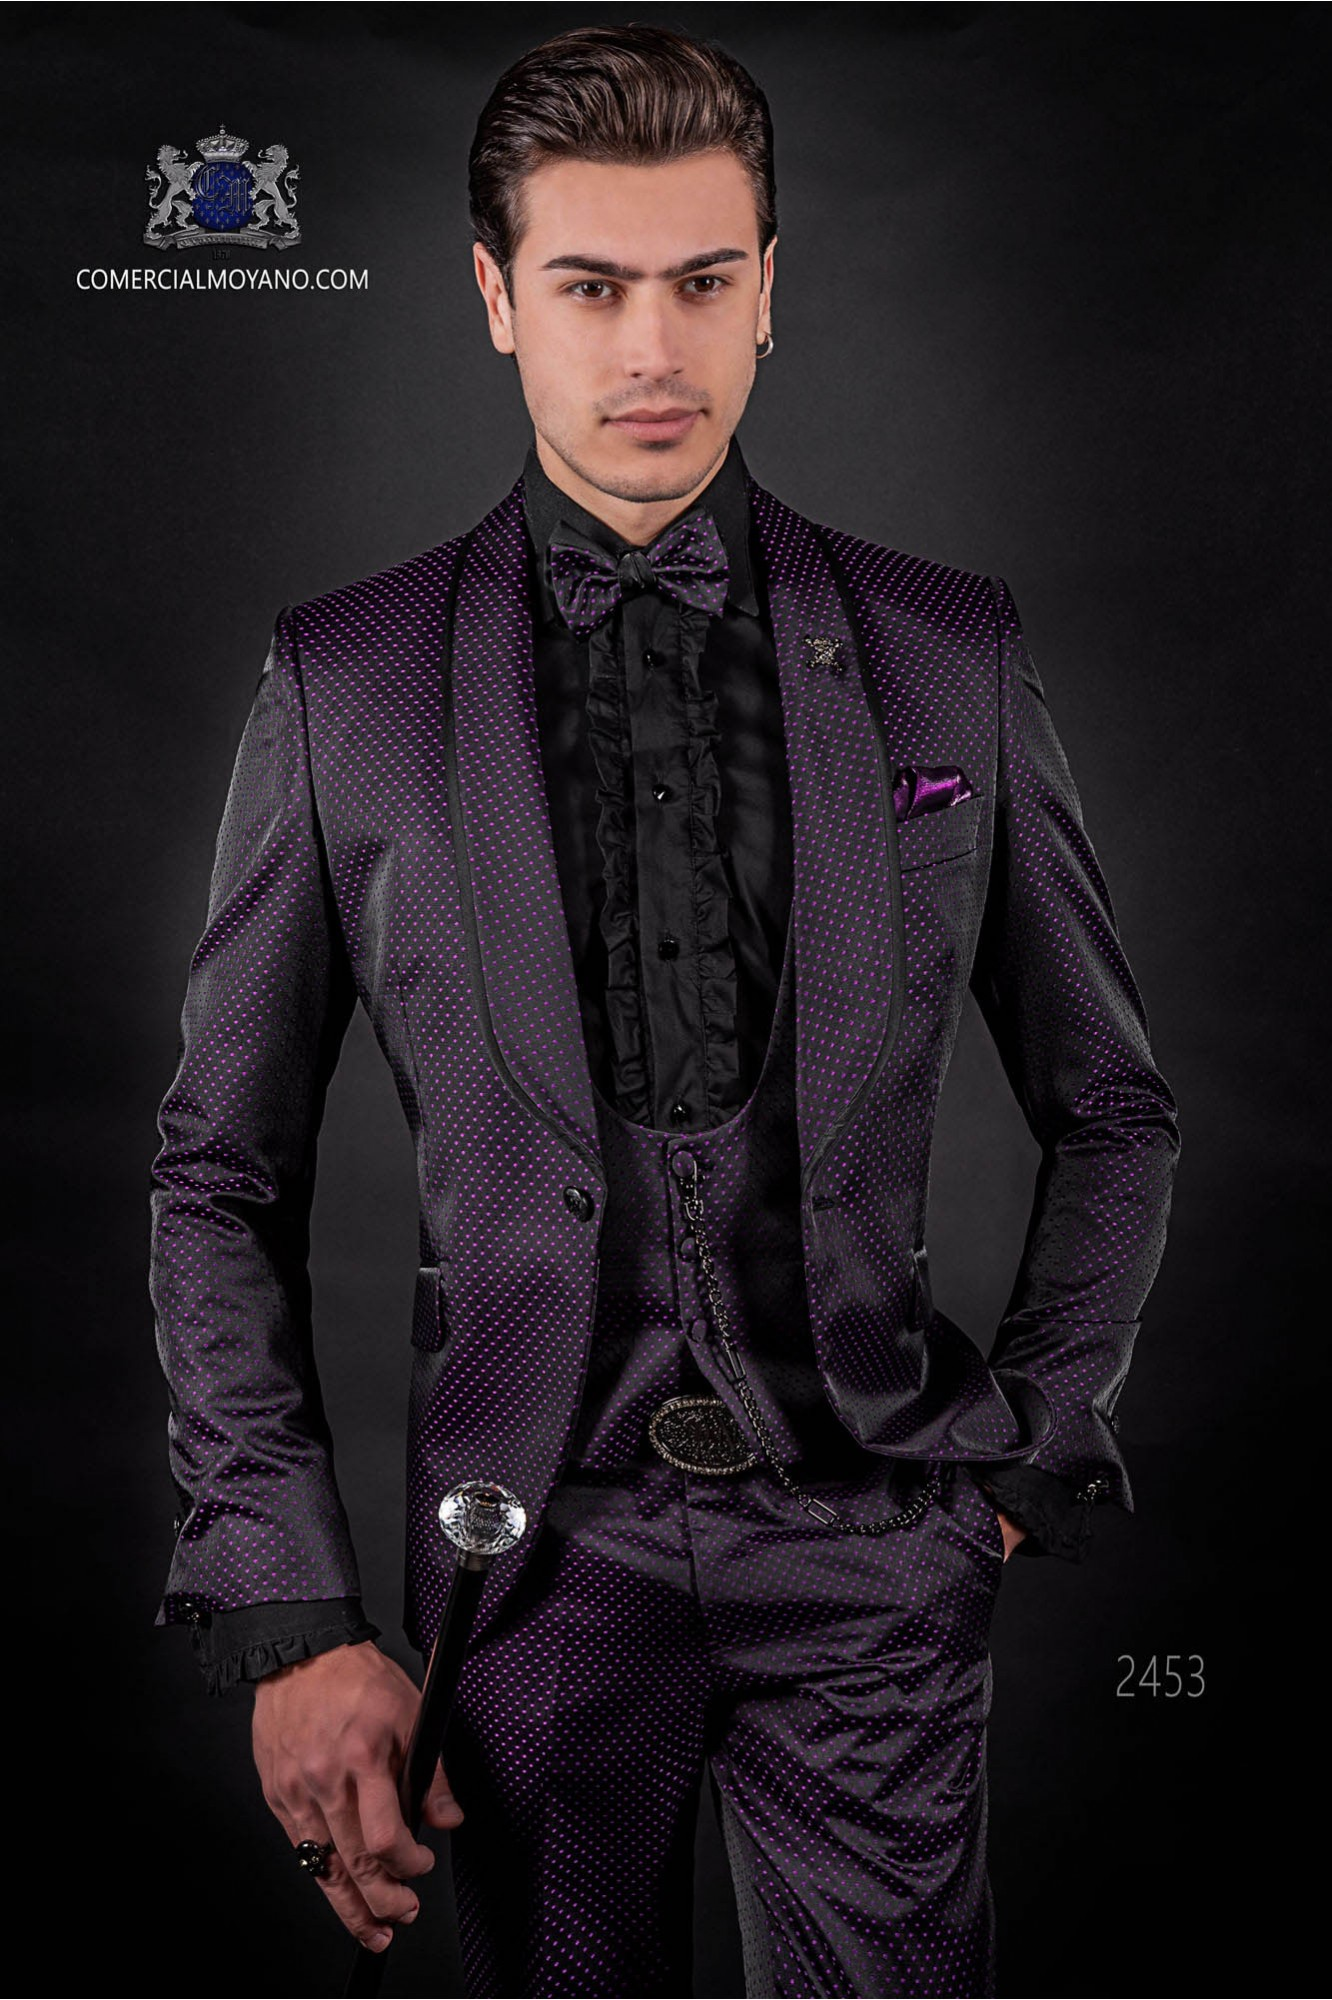 Traje de moda esmoquin italiano micro diseño negro-púrpura con solapa chal